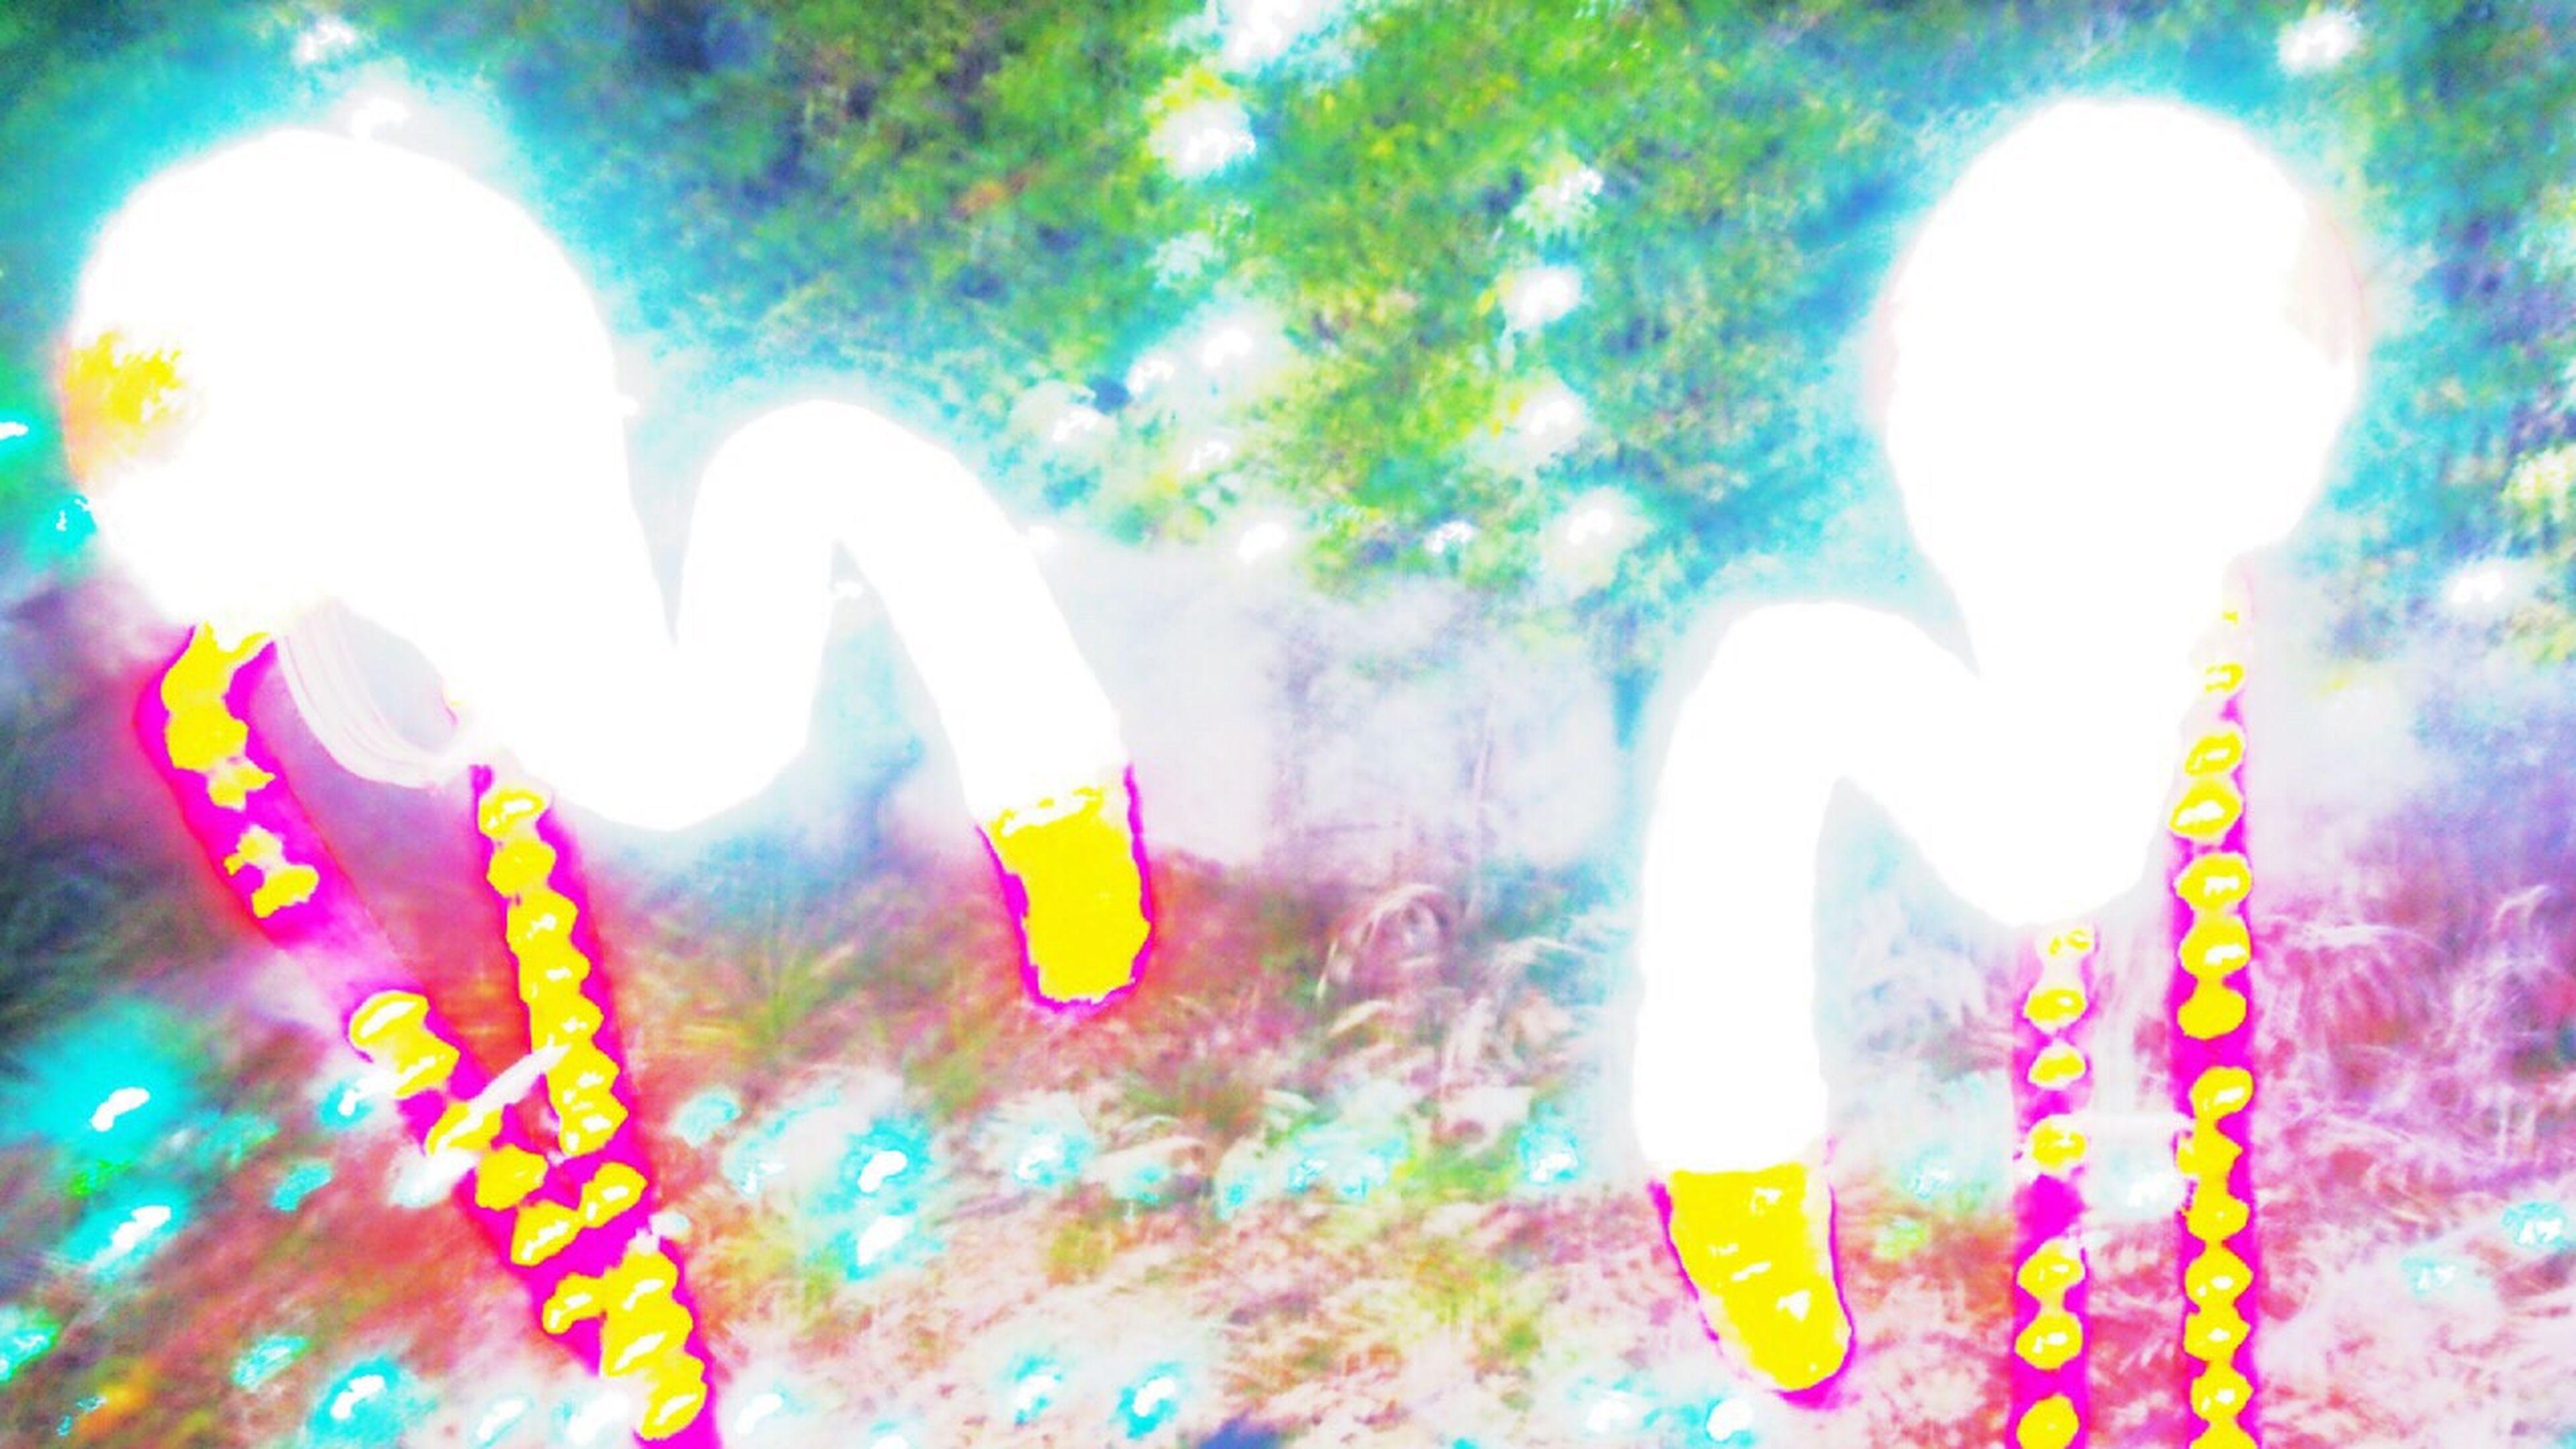 illuminated, low angle view, blue, human representation, lighting equipment, art, art and craft, creativity, lens flare, multi colored, indoors, decoration, close-up, celebration, light - natural phenomenon, sunlight, sky, green color